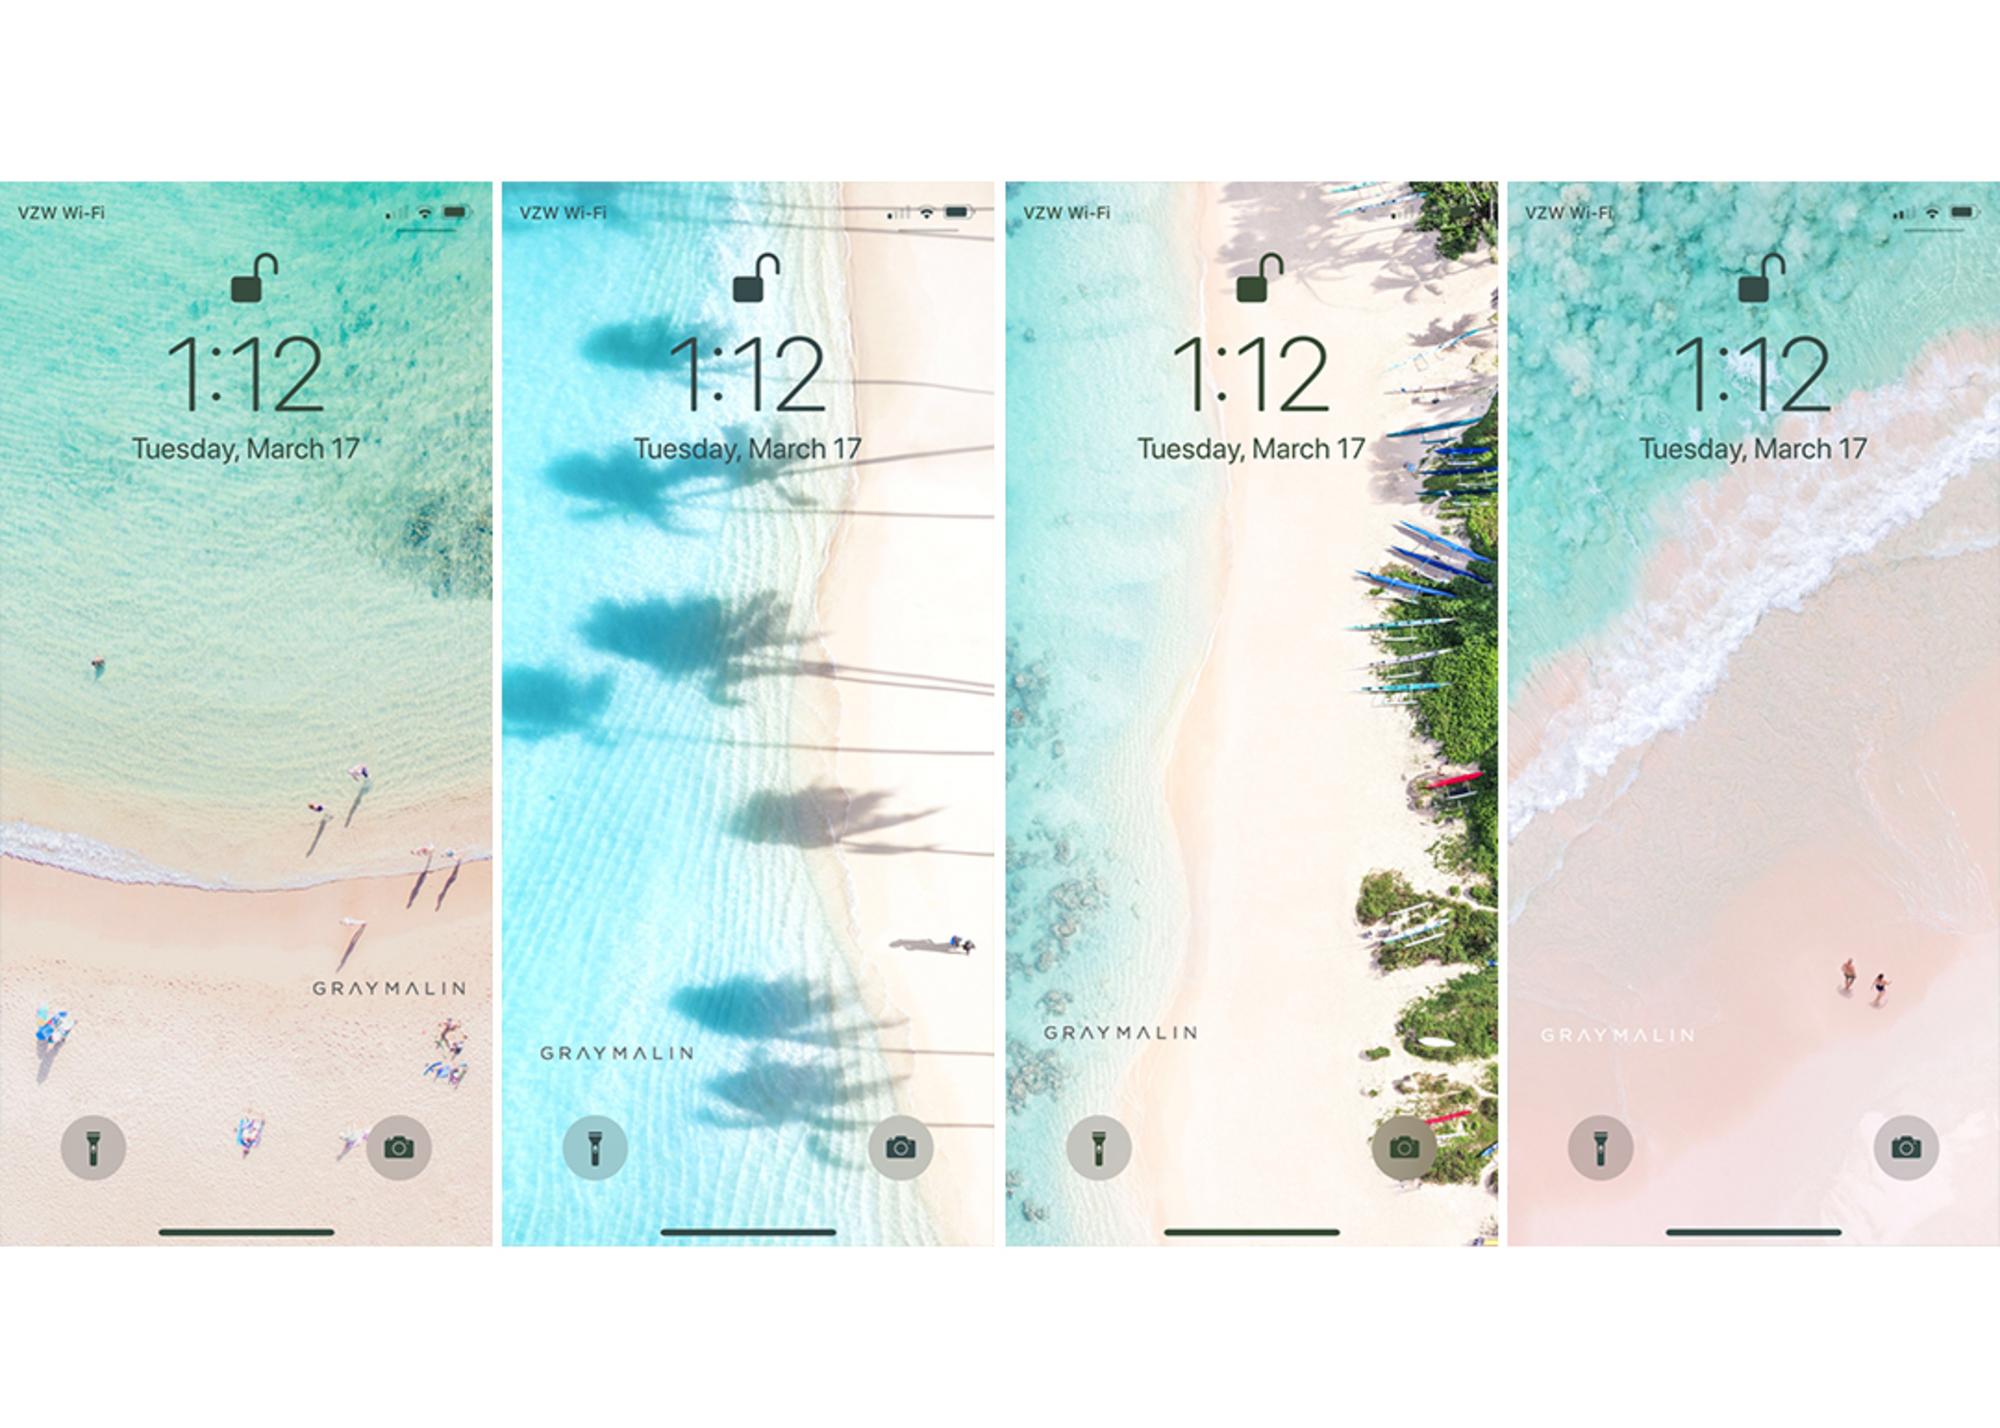 Phone Backgrounds from Gray Malin Gray Malin 2000x1428